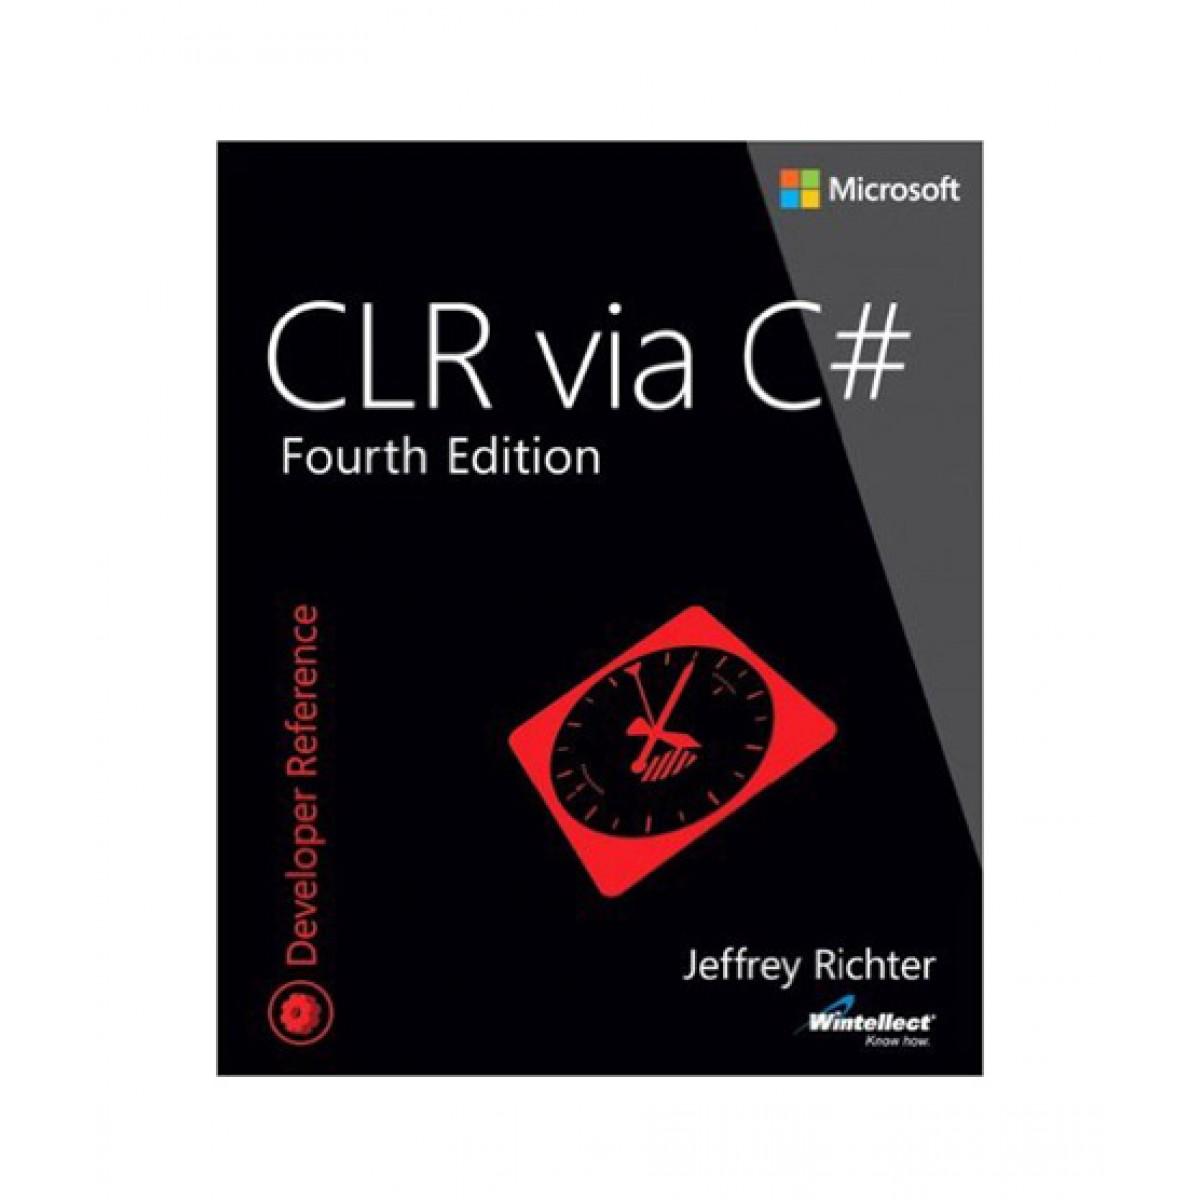 Episode 113 | Jeffrey Richter - Software Business Family